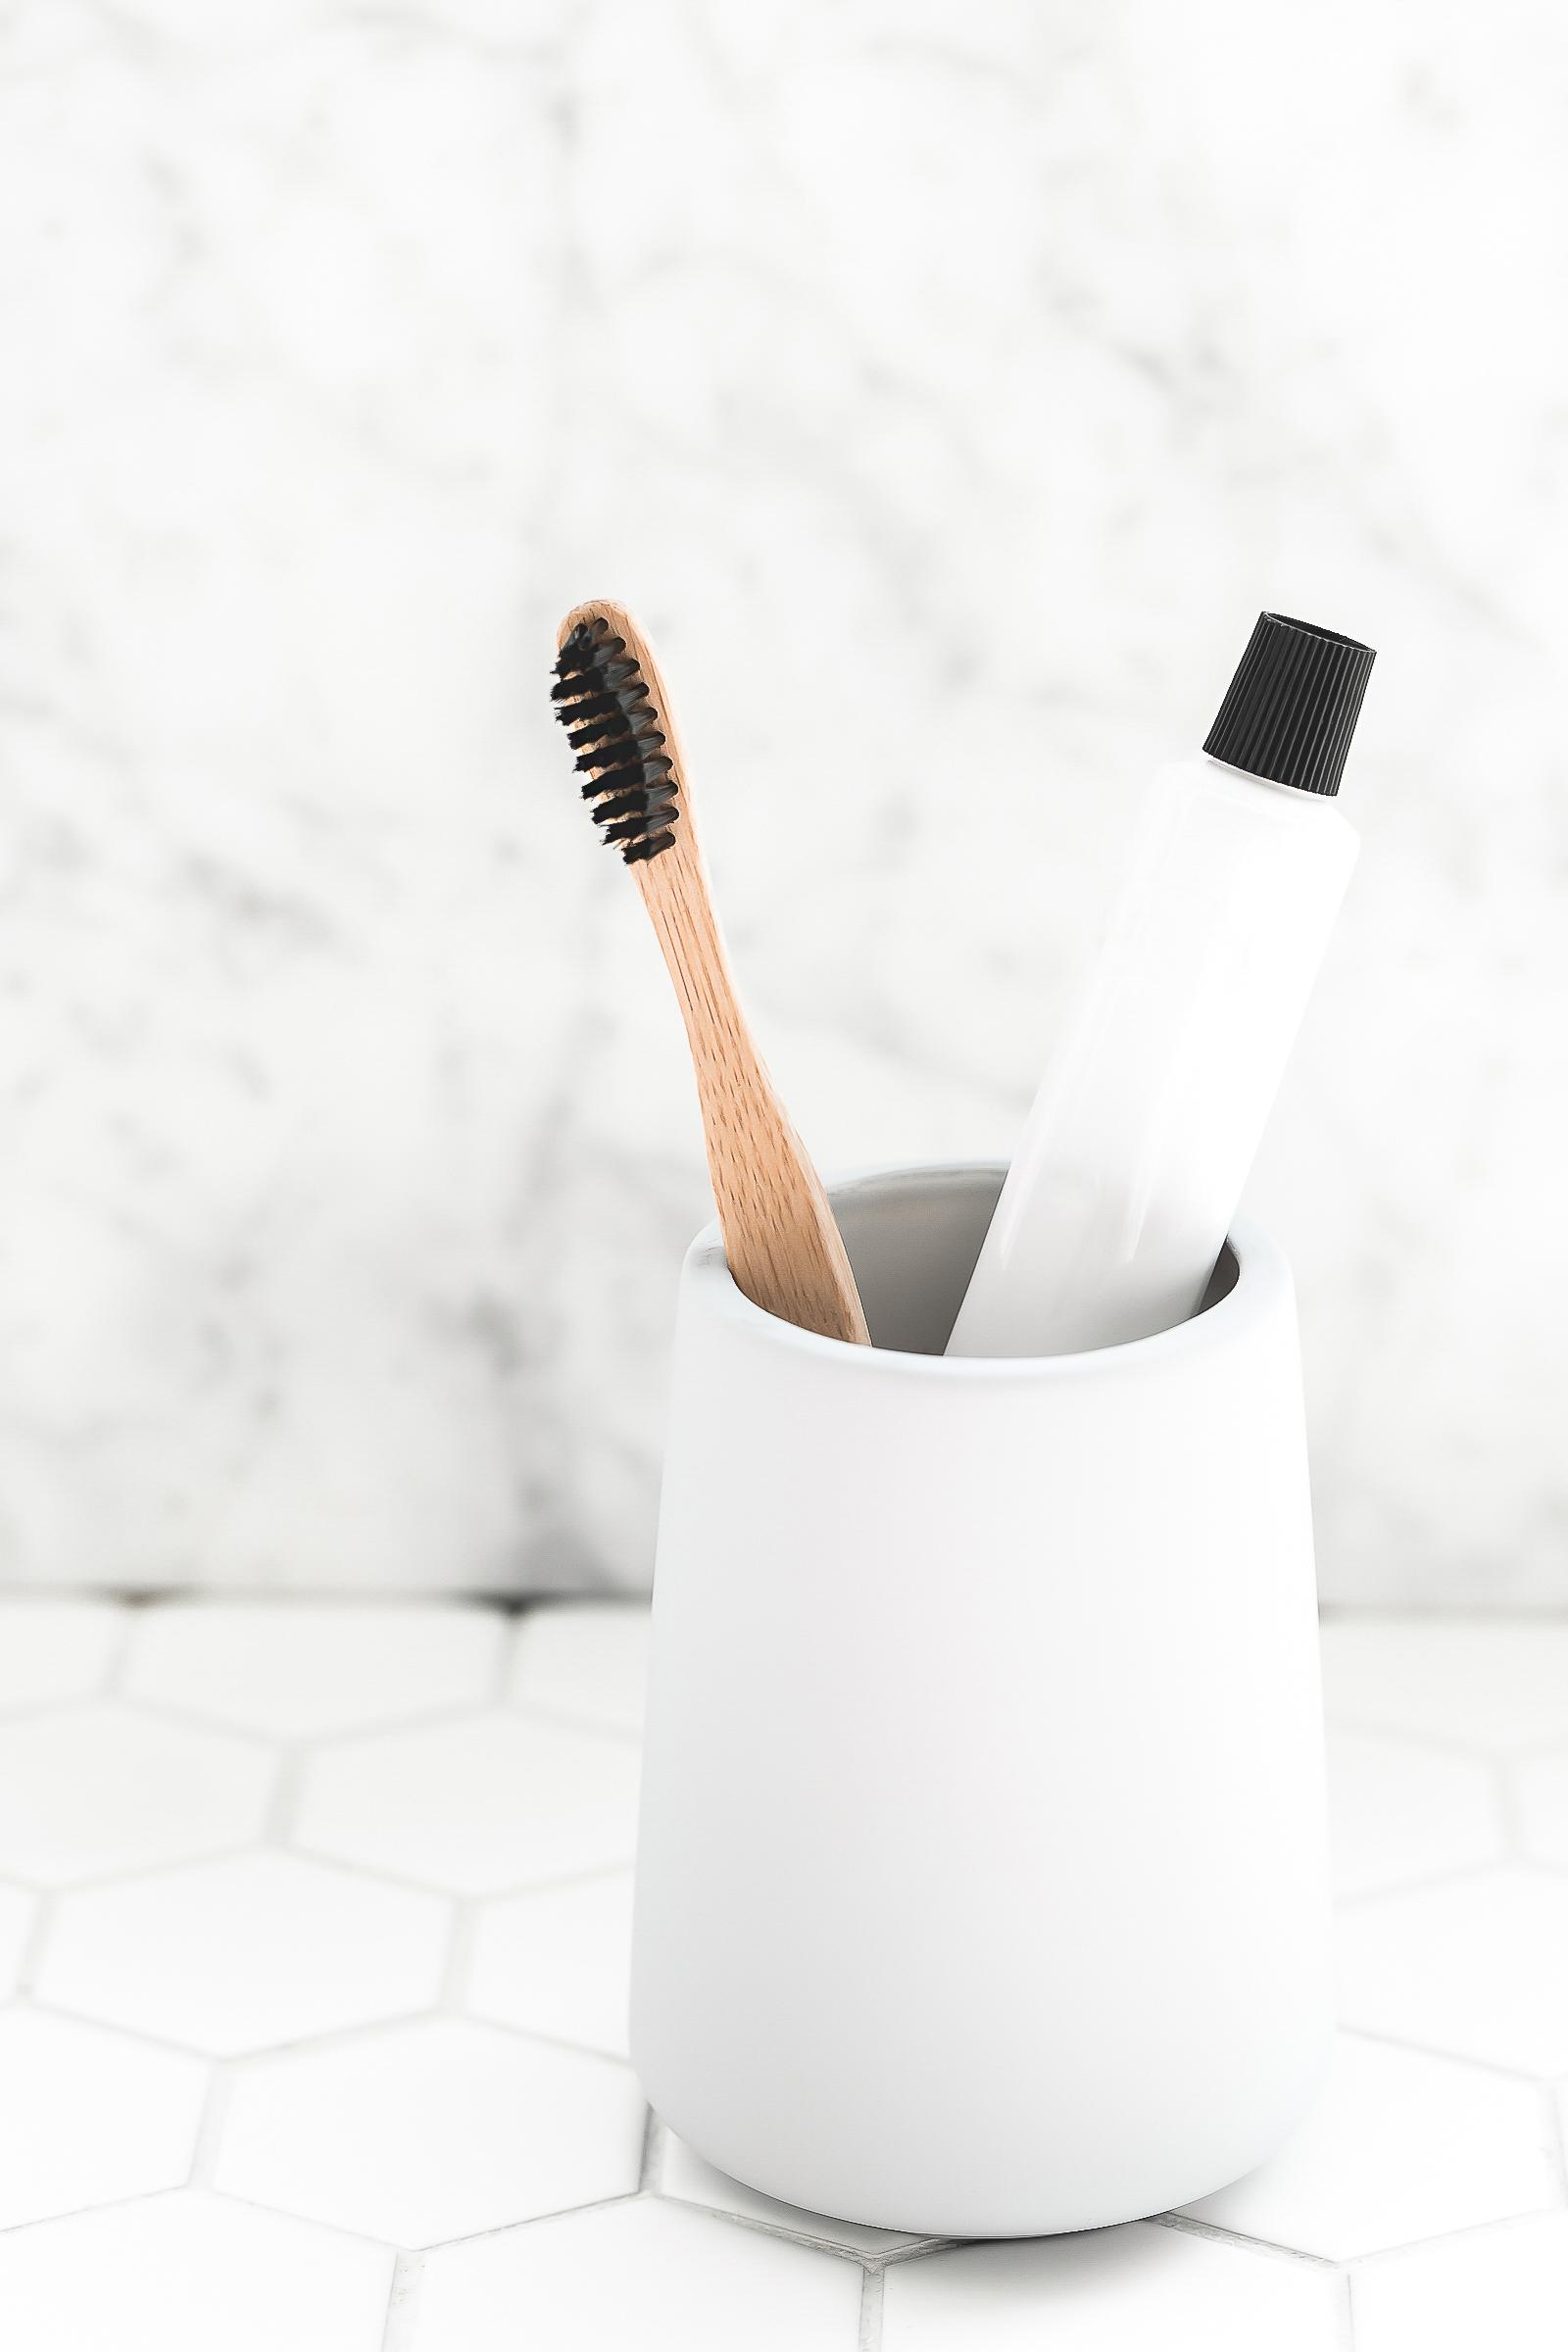 organized_toothbrush.jpg